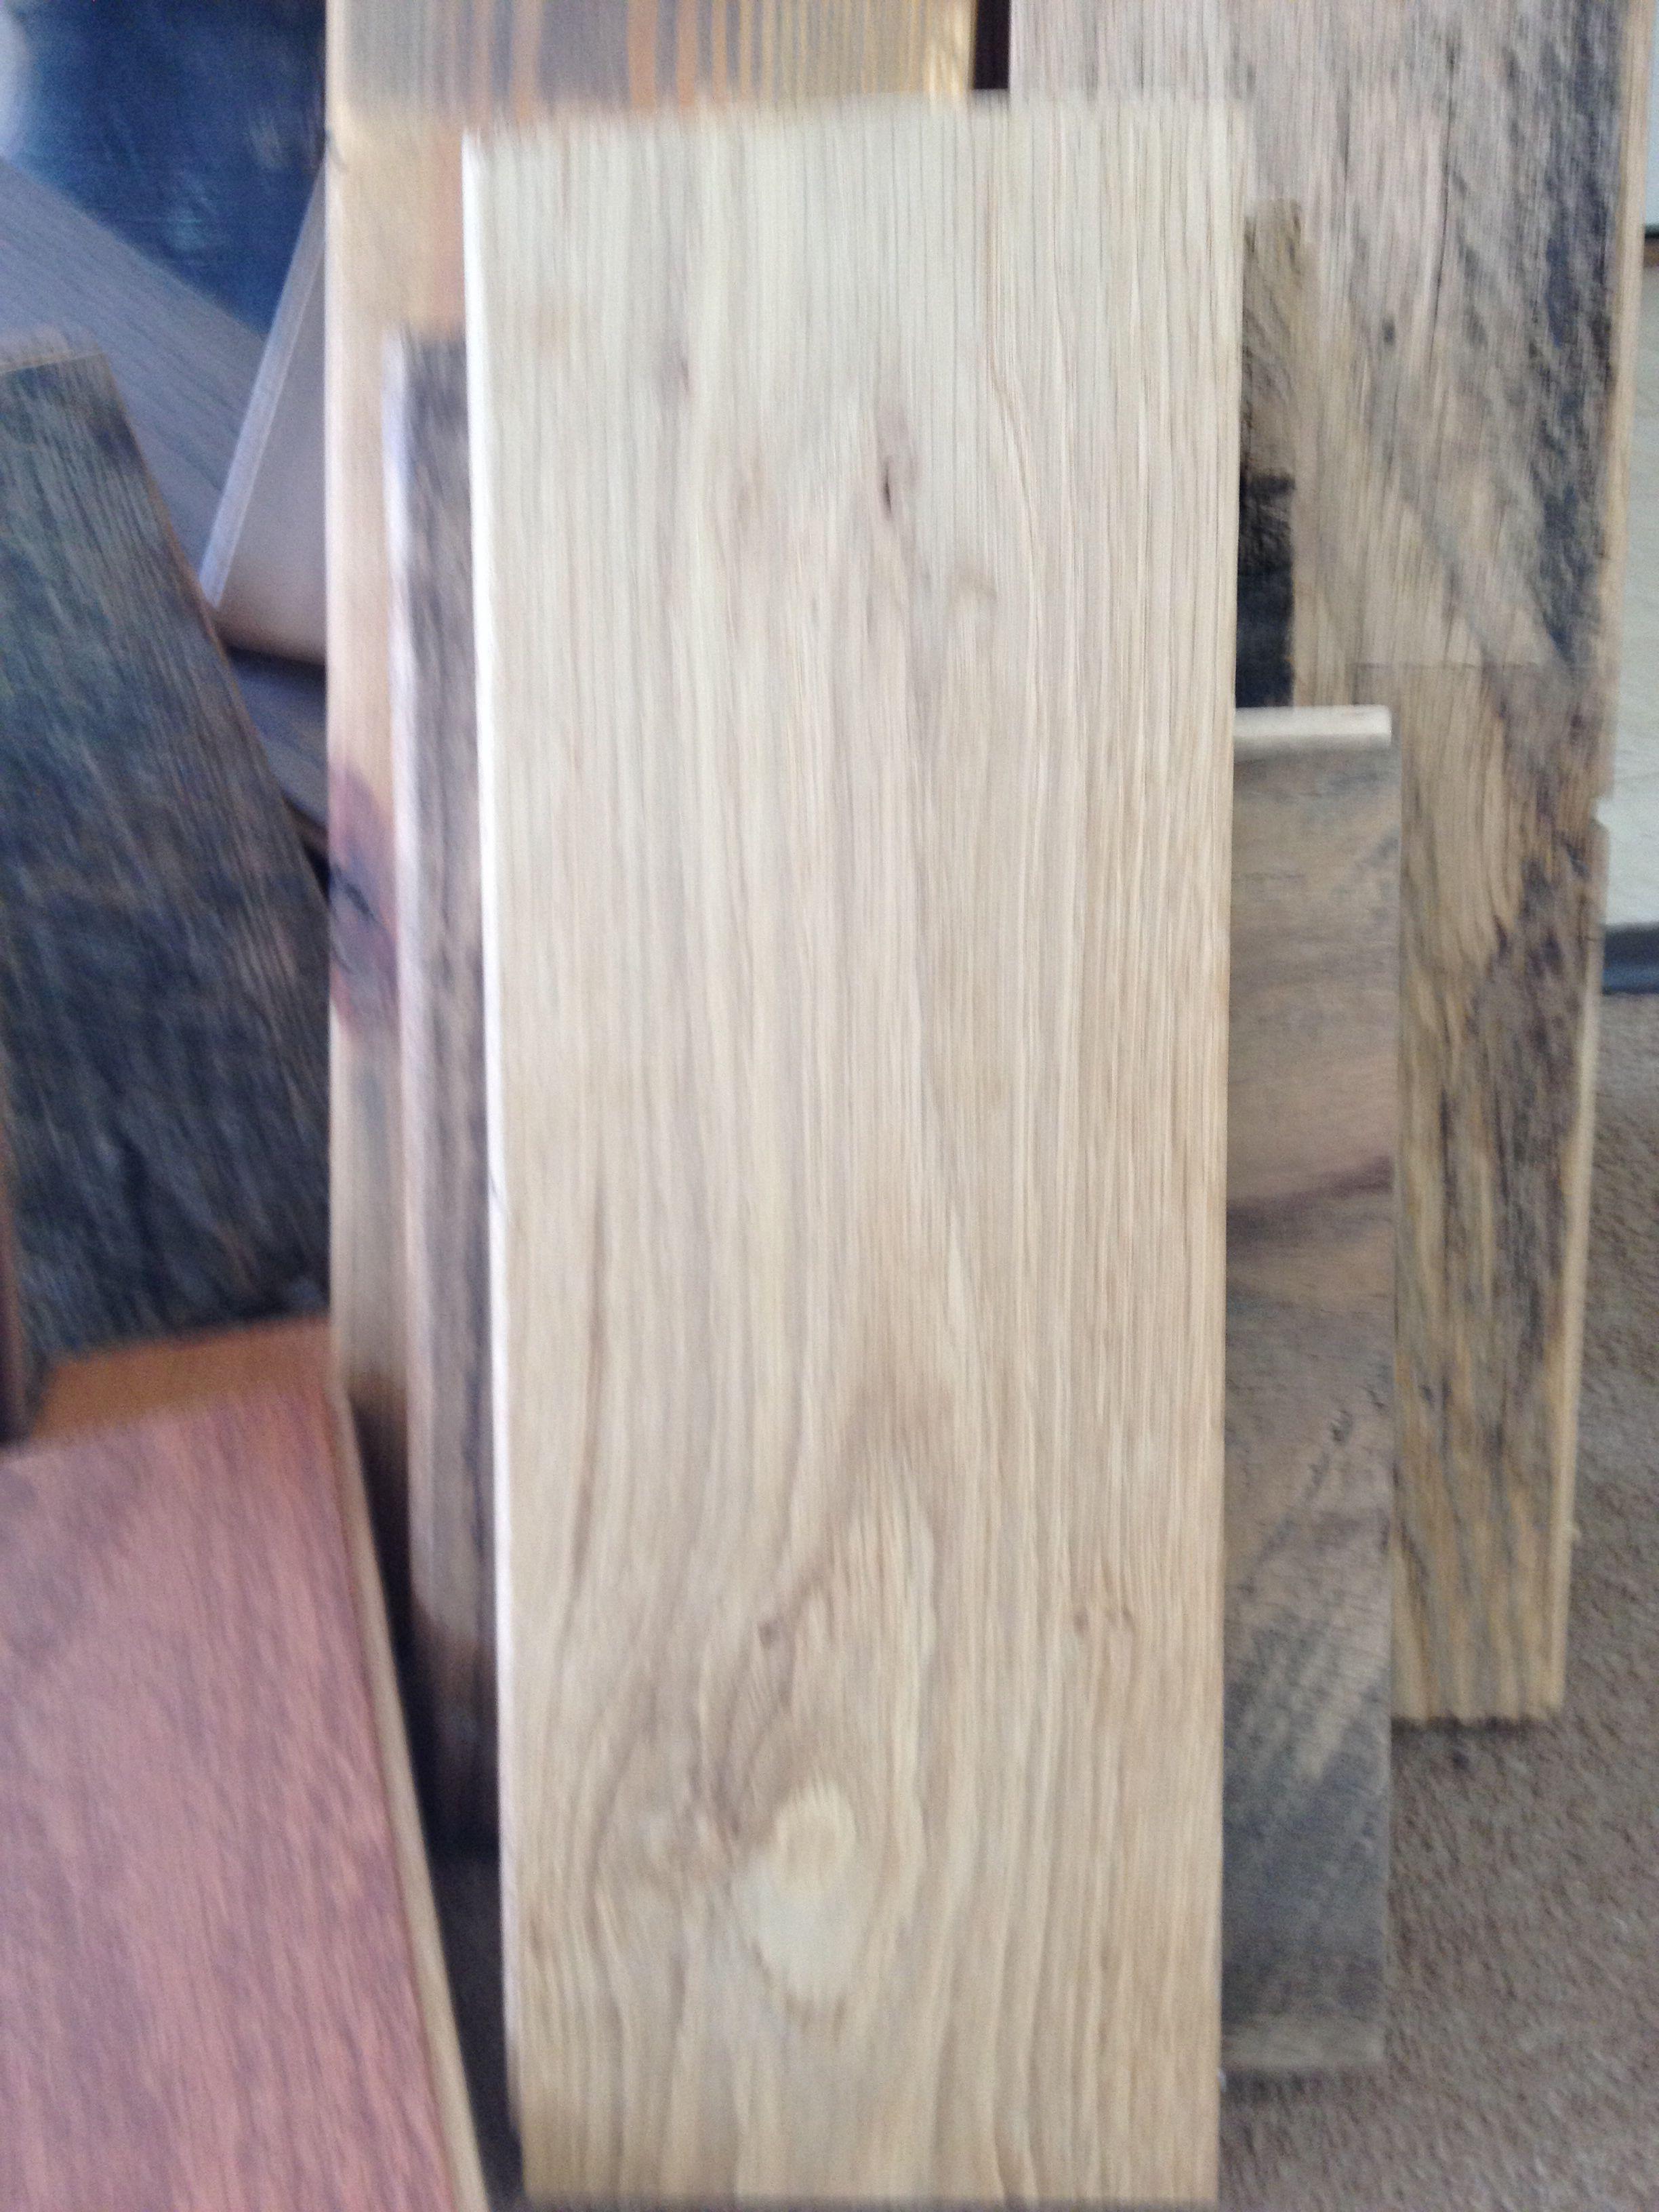 4 Australian Cypress Des Flooring Panama City Bch Fl